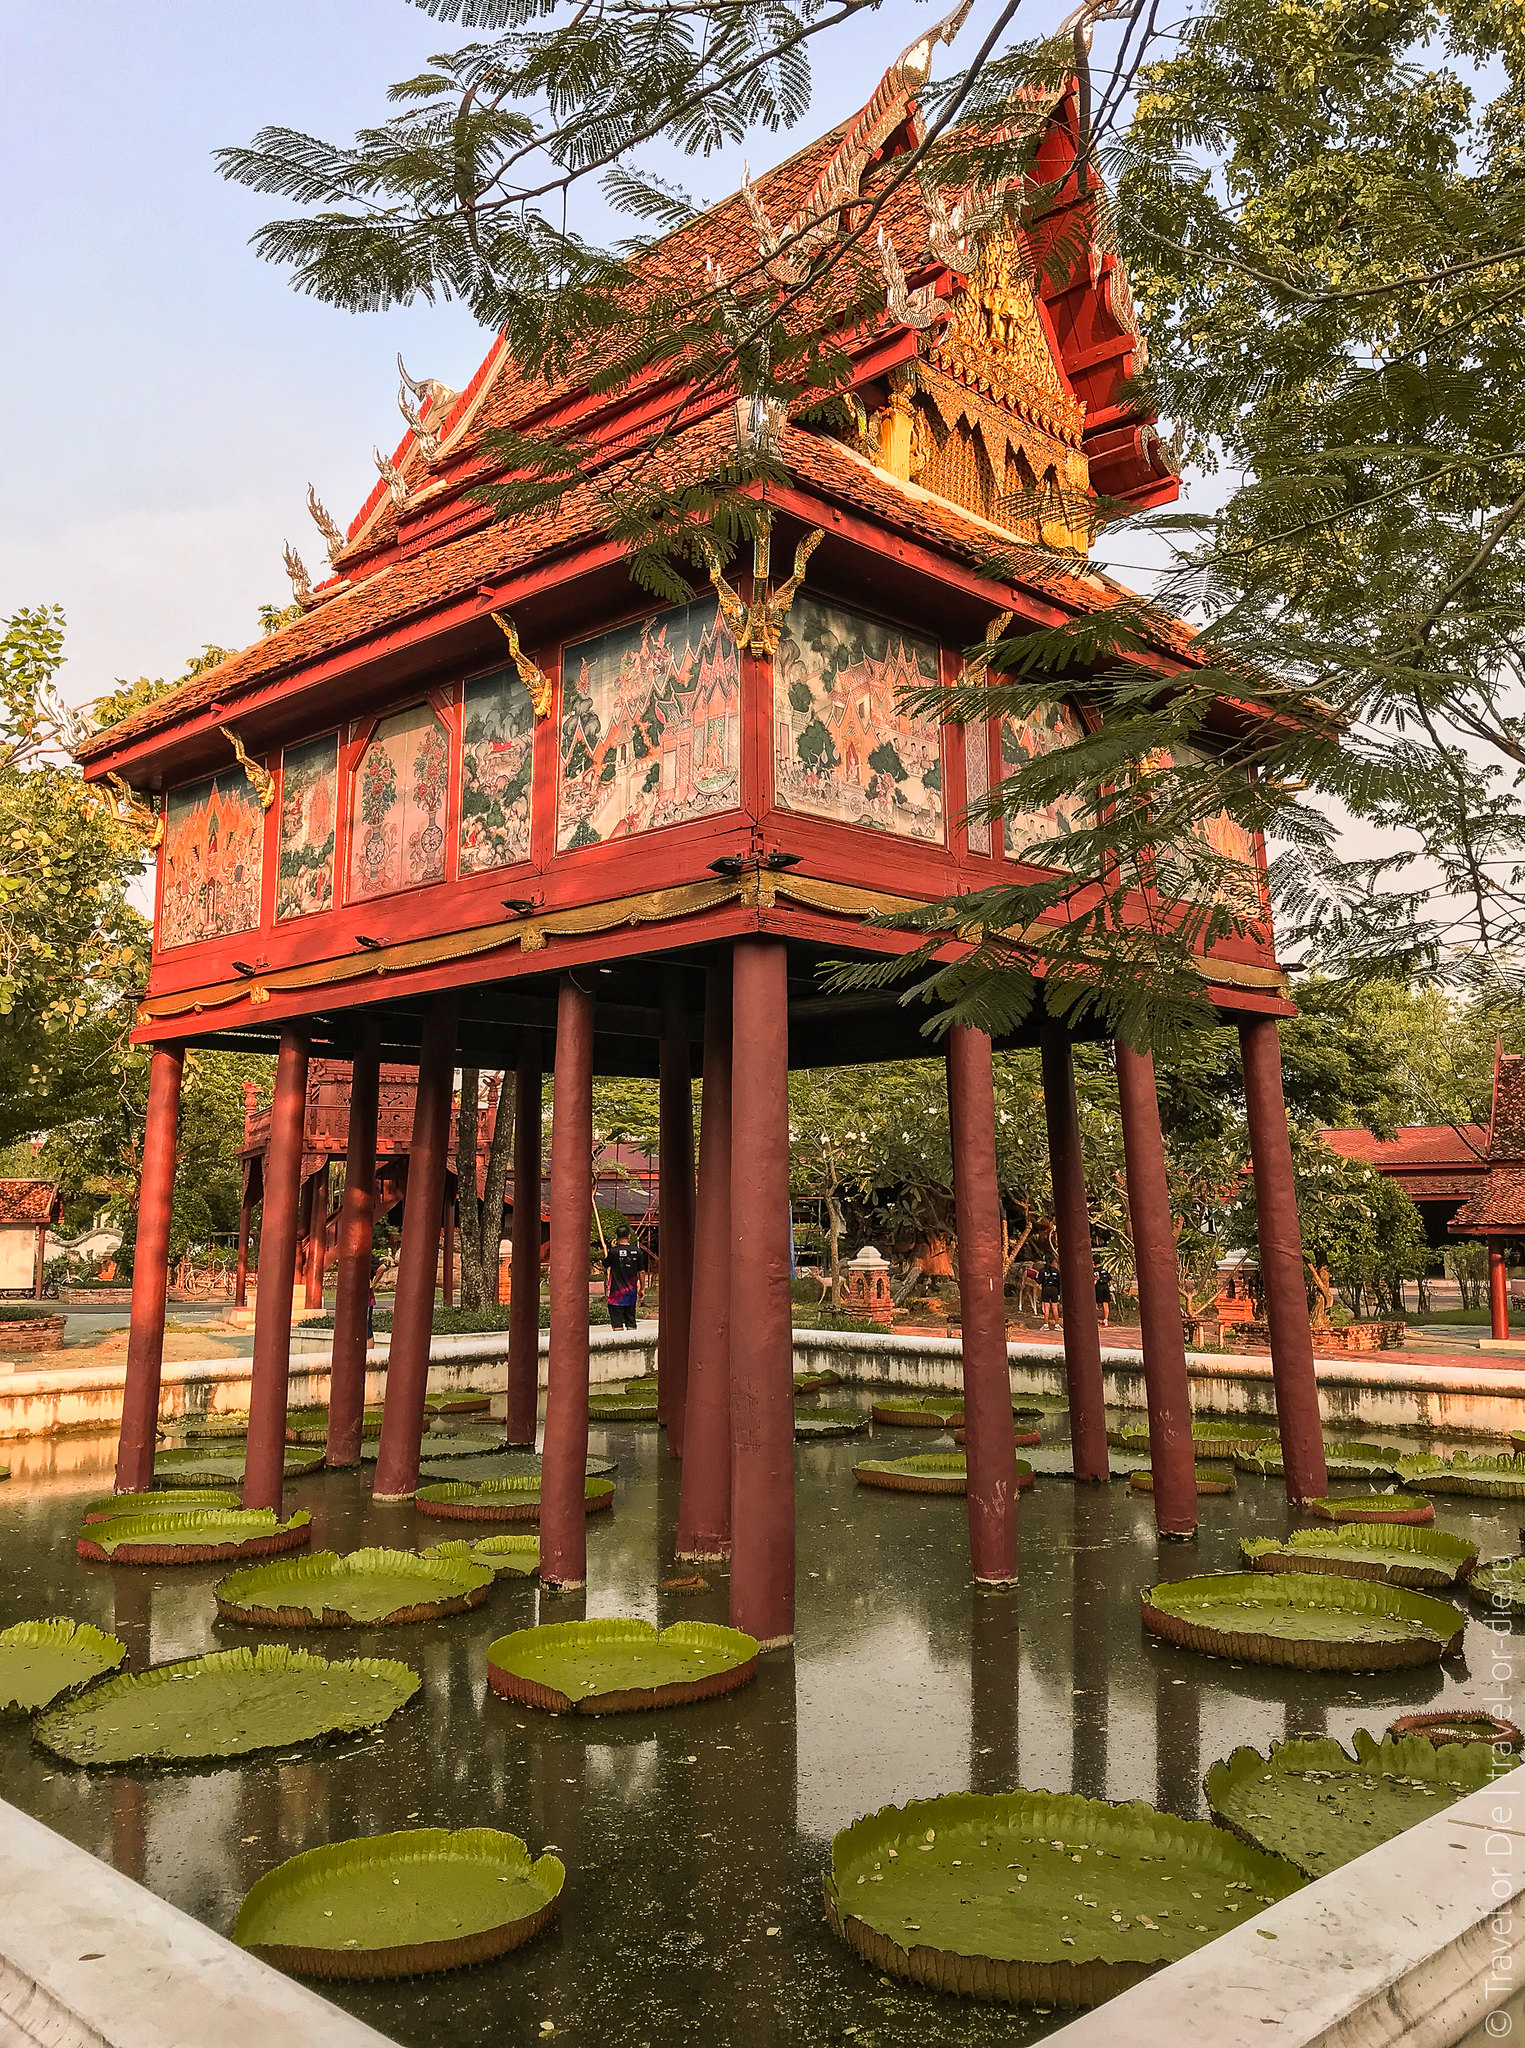 Ancient-City-Muang-Boran-Bangkok-9774